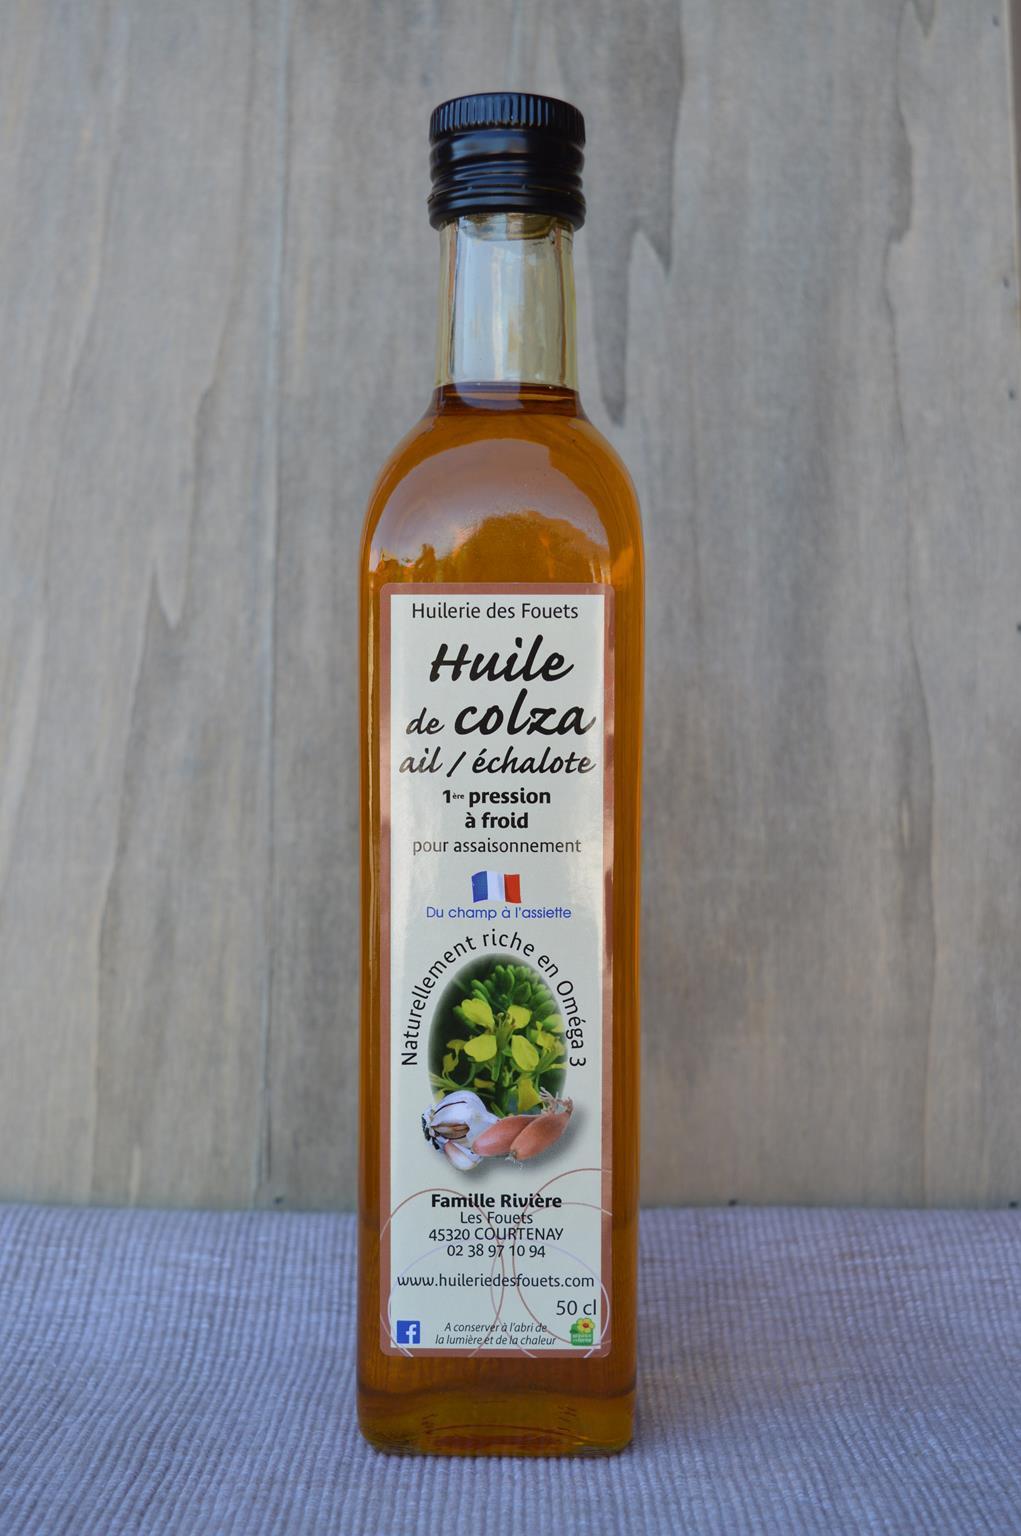 Huile colza ail echalote premiere pression froid 50cl huilerie des fouets copy